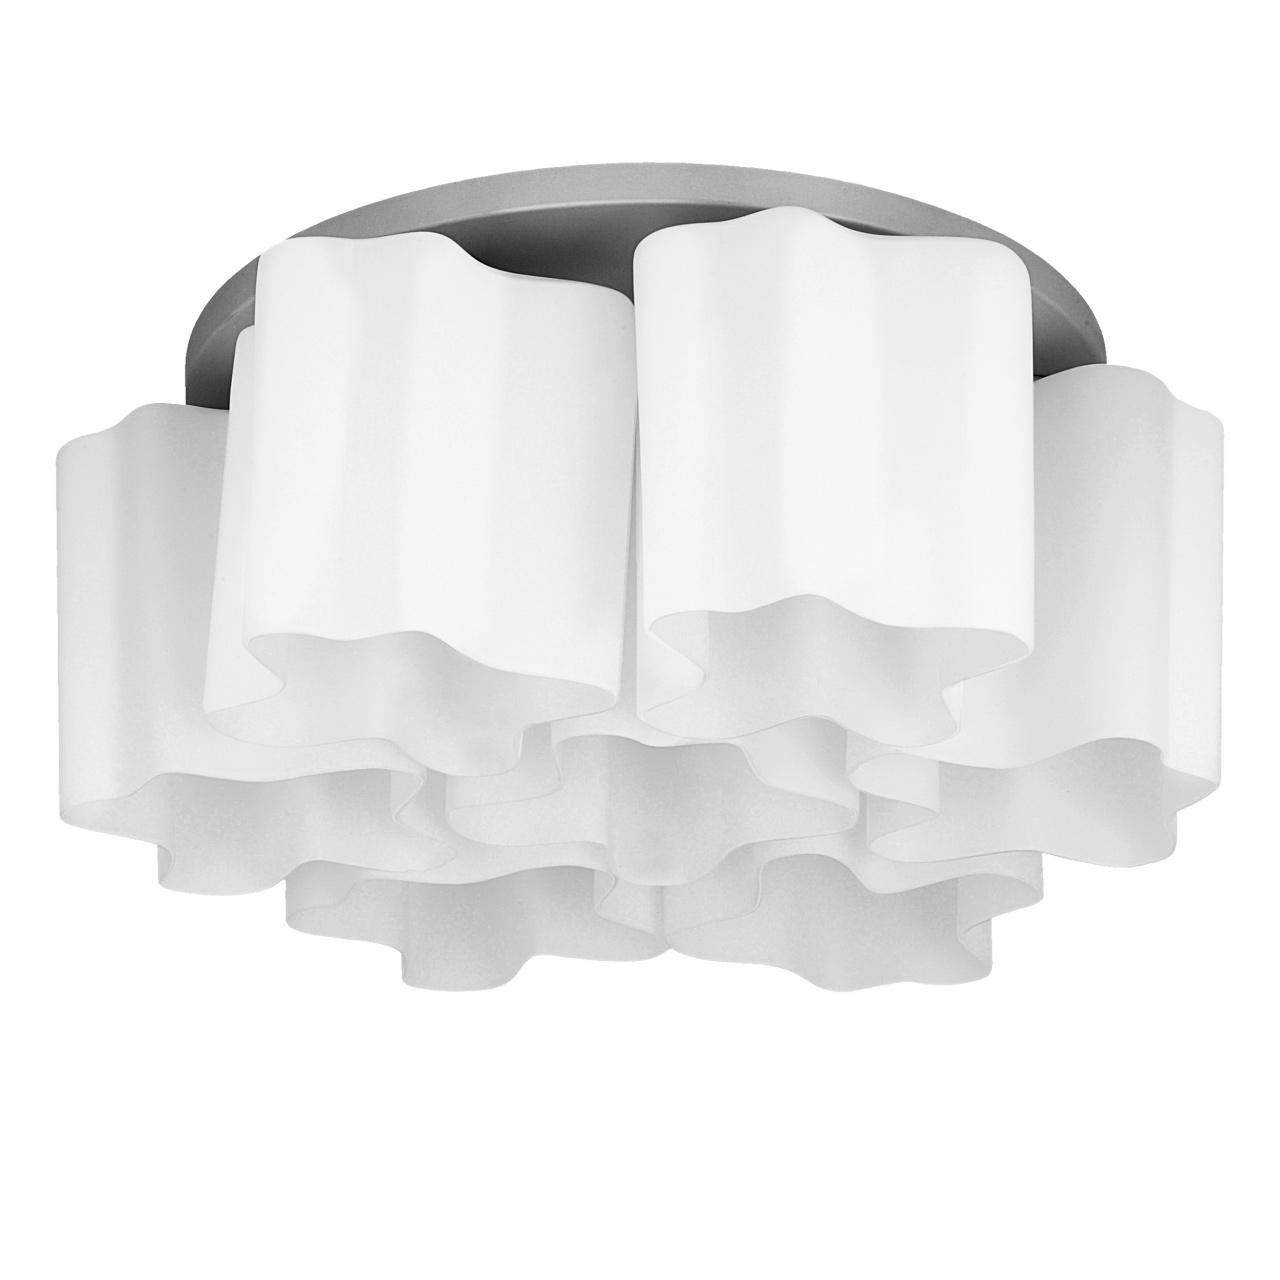 Люстра потолочная Nubi 7х40W E27 хром / белый Lightstar 802070